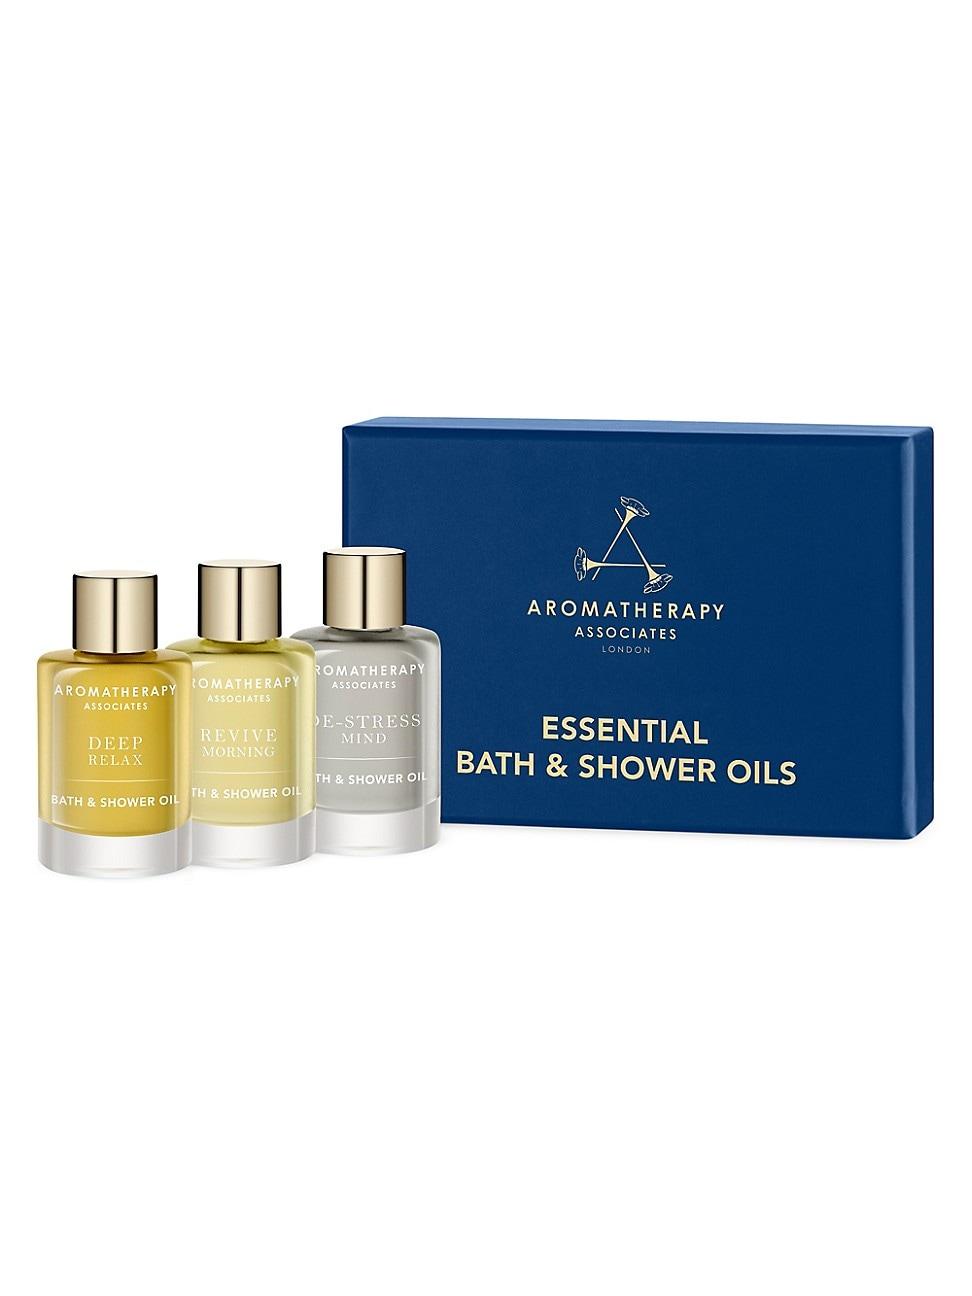 Aromatherapy Associates Women's Essential Bath & Shower Oils